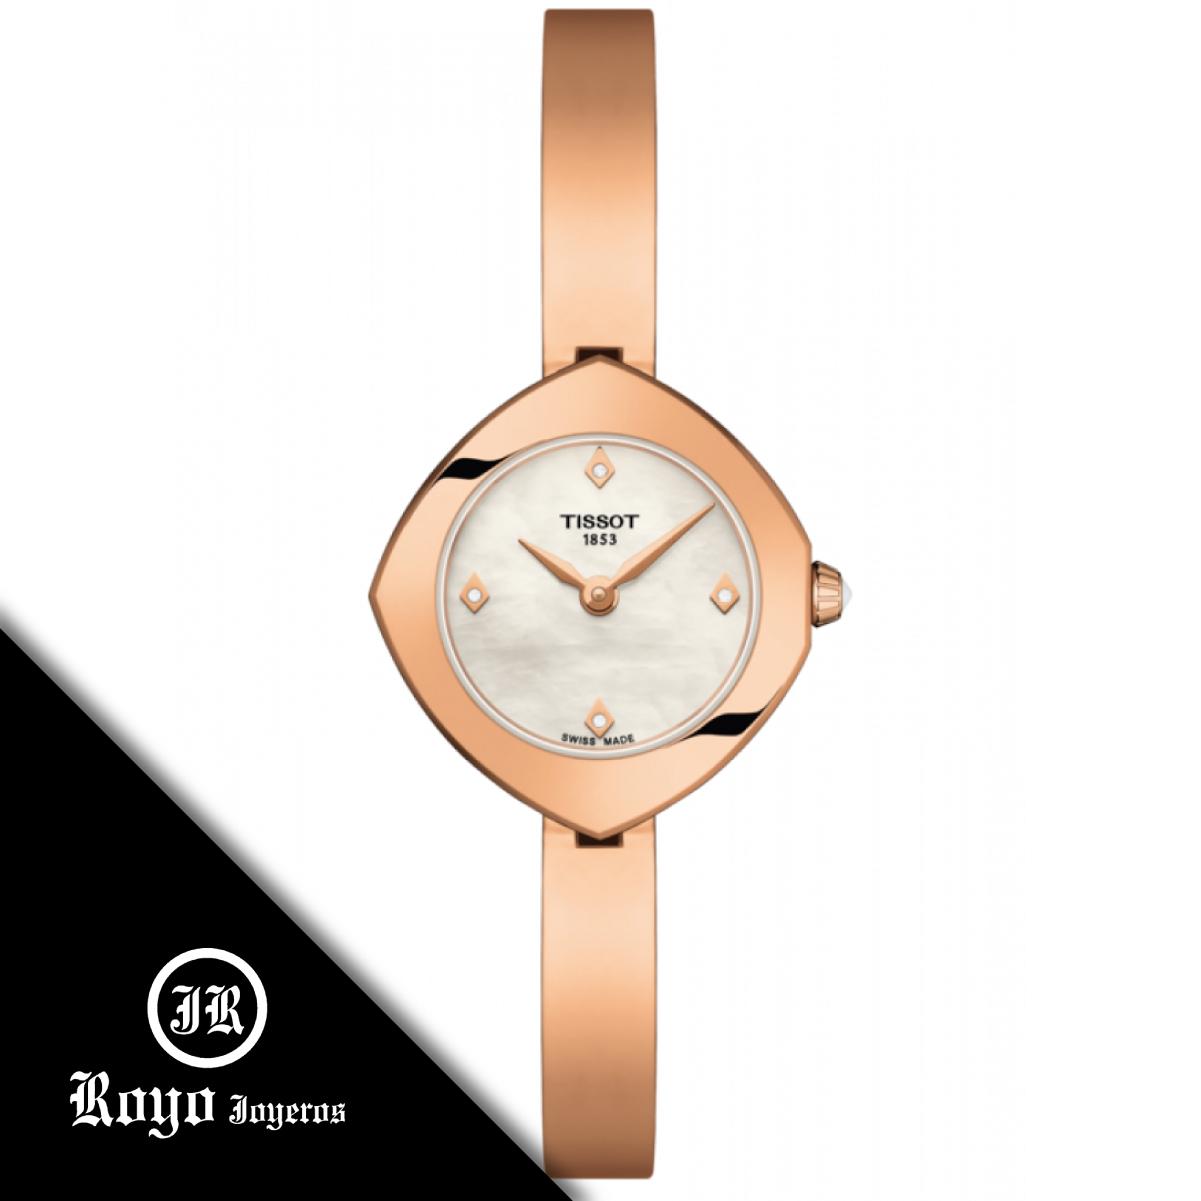 reloj tissot femini oro rosa joyeria royo albacete